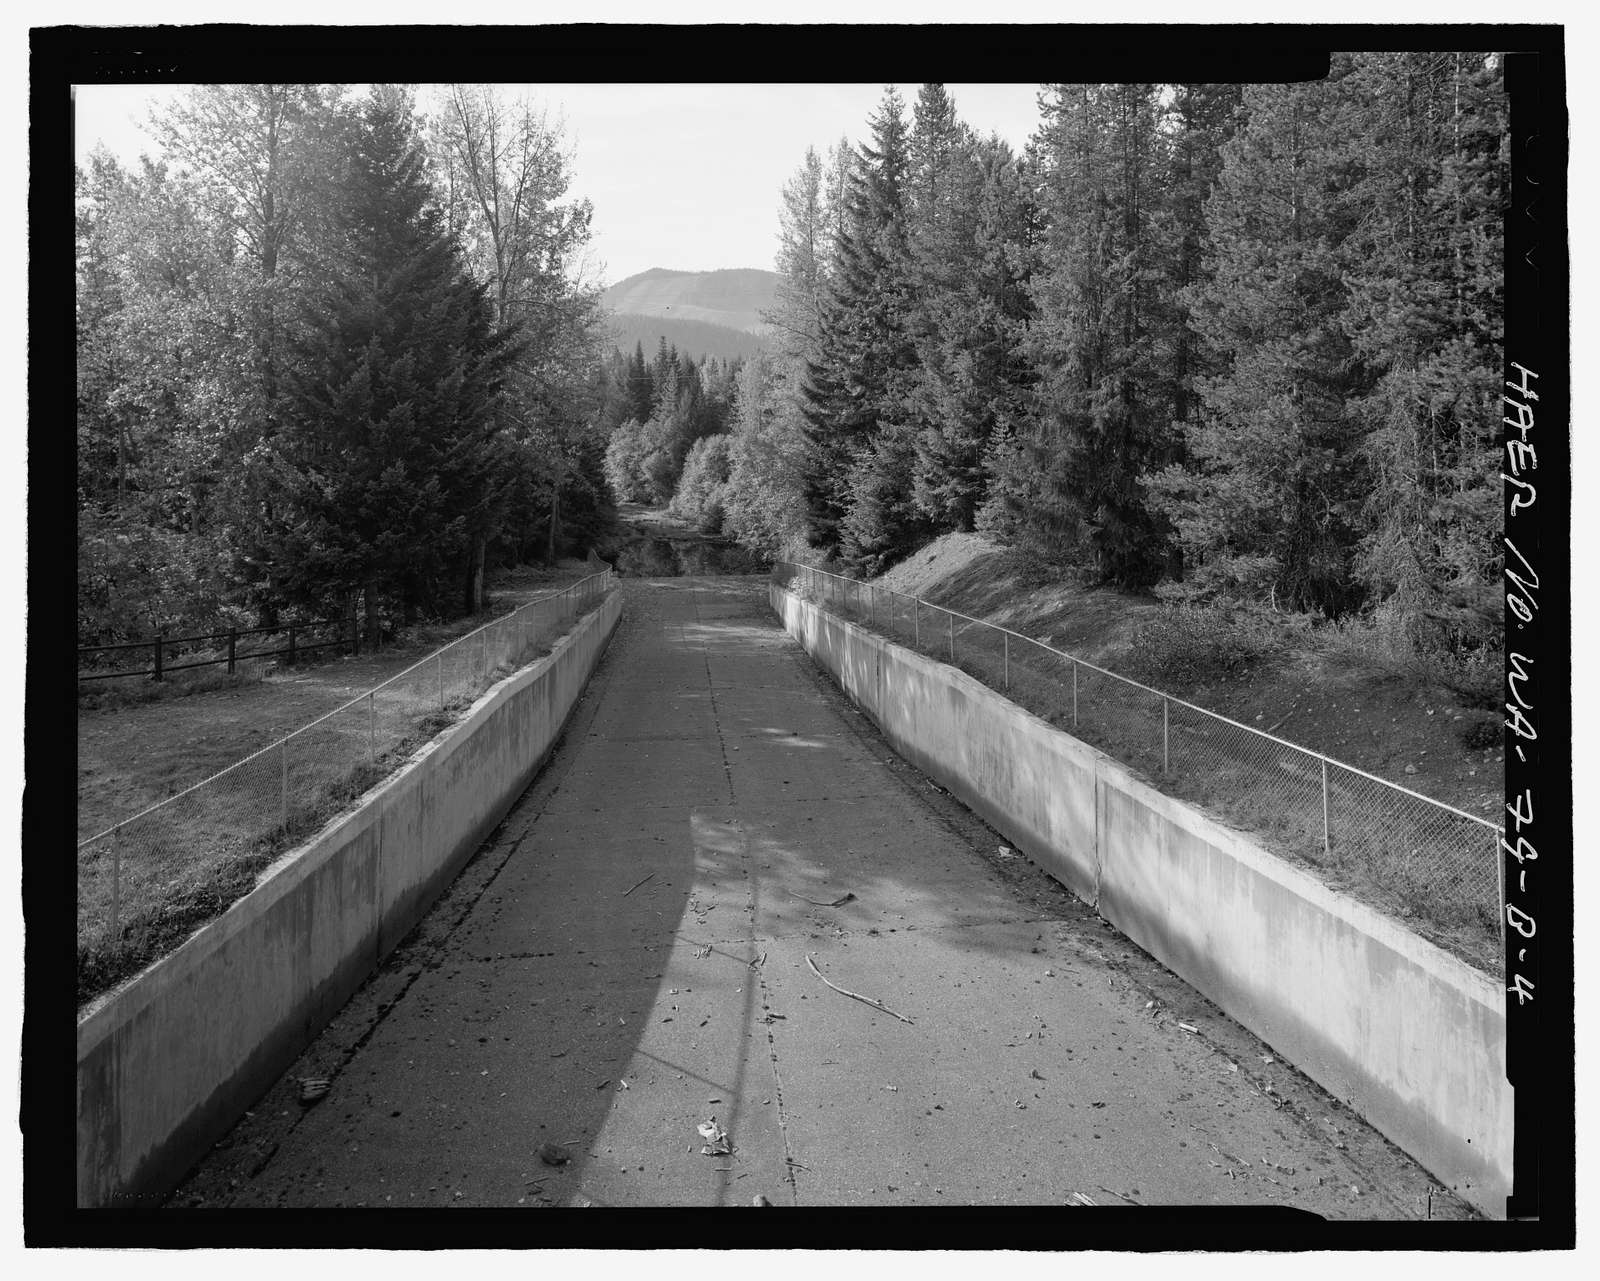 Kachess Dam, 1936 Spillway and Radial Gates, Kachess River, 1.5 miles north of Interstate 90, Easton, Kittitas County, WA